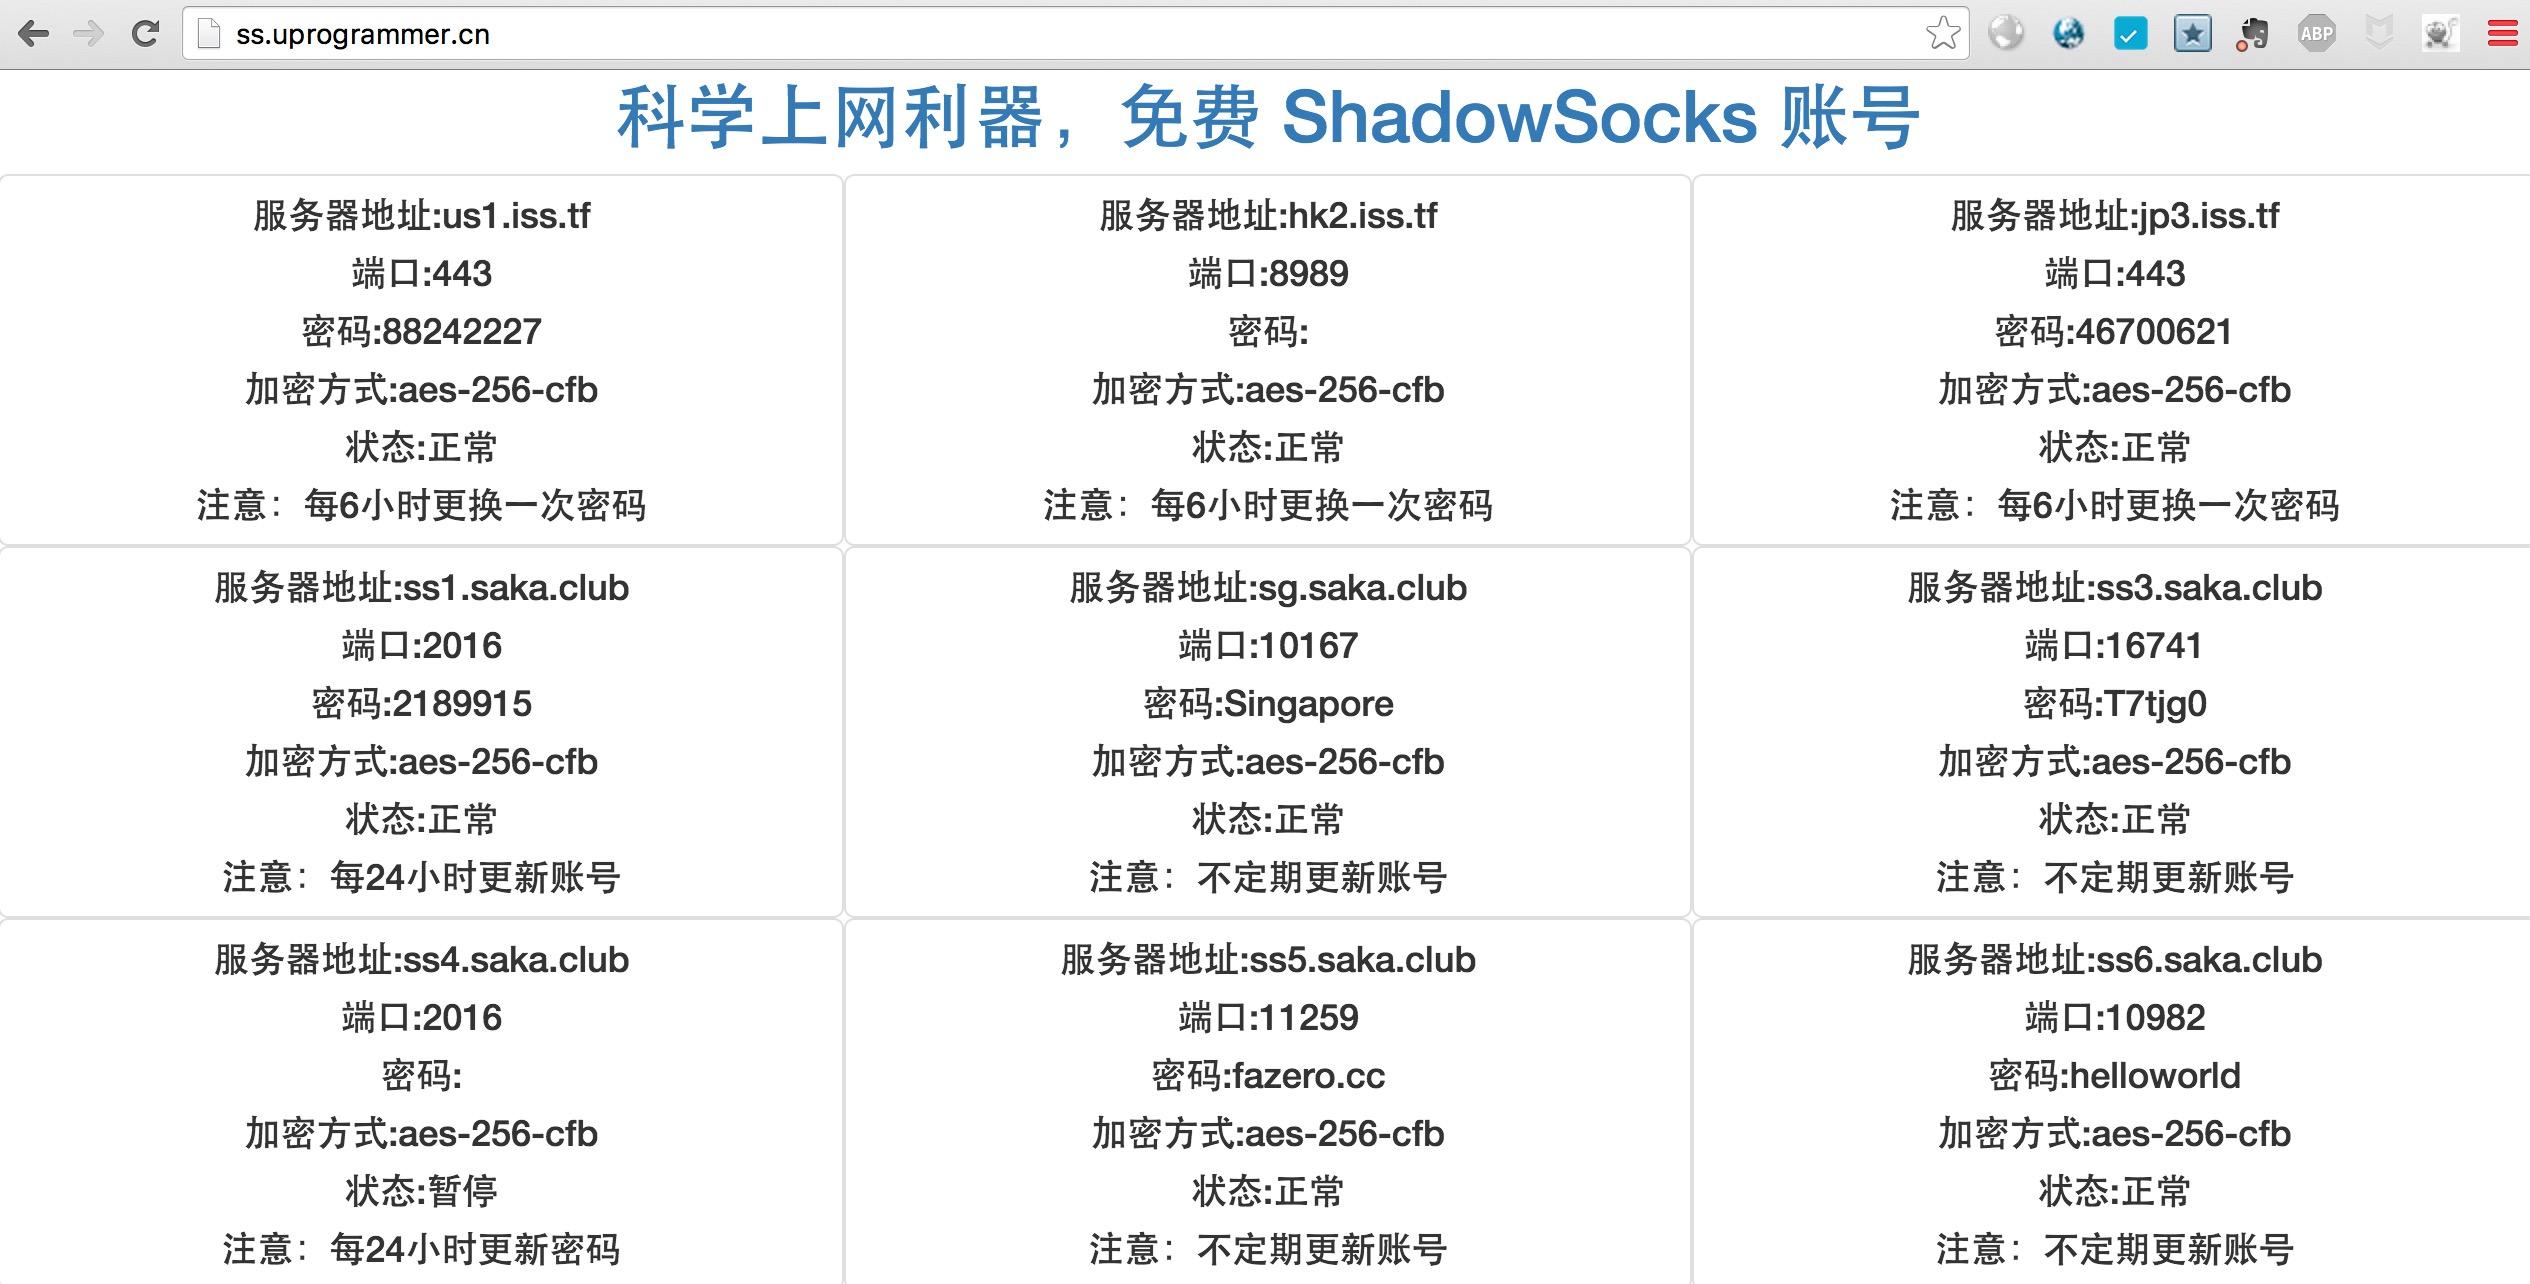 http://ss.uprogrammer.cn 科学上网,免费shadowsocks账号